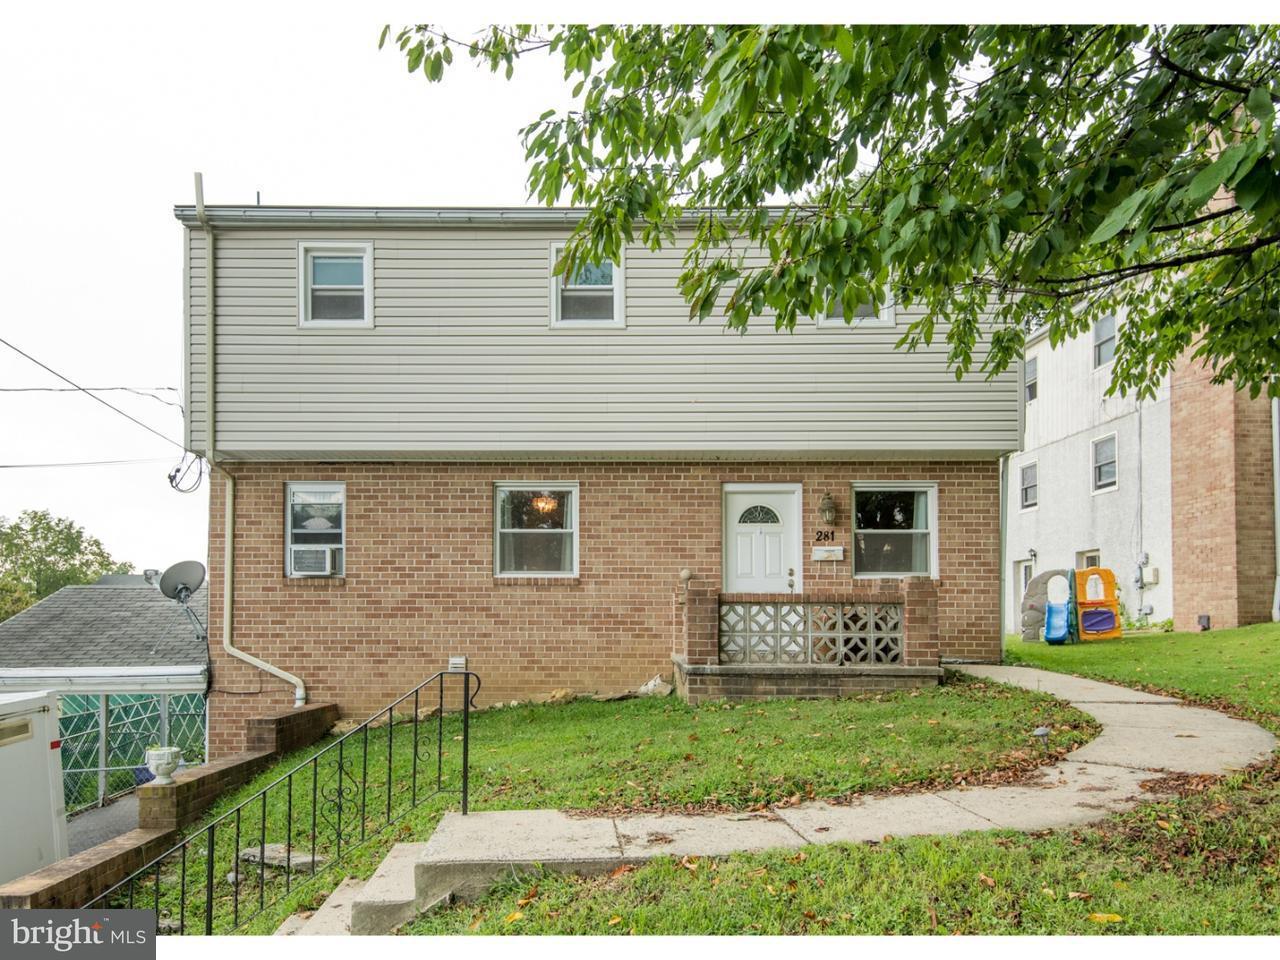 Single Family Home for Sale at 281 SUMMIT Avenue Conshohocken, Pennsylvania 19428 United States